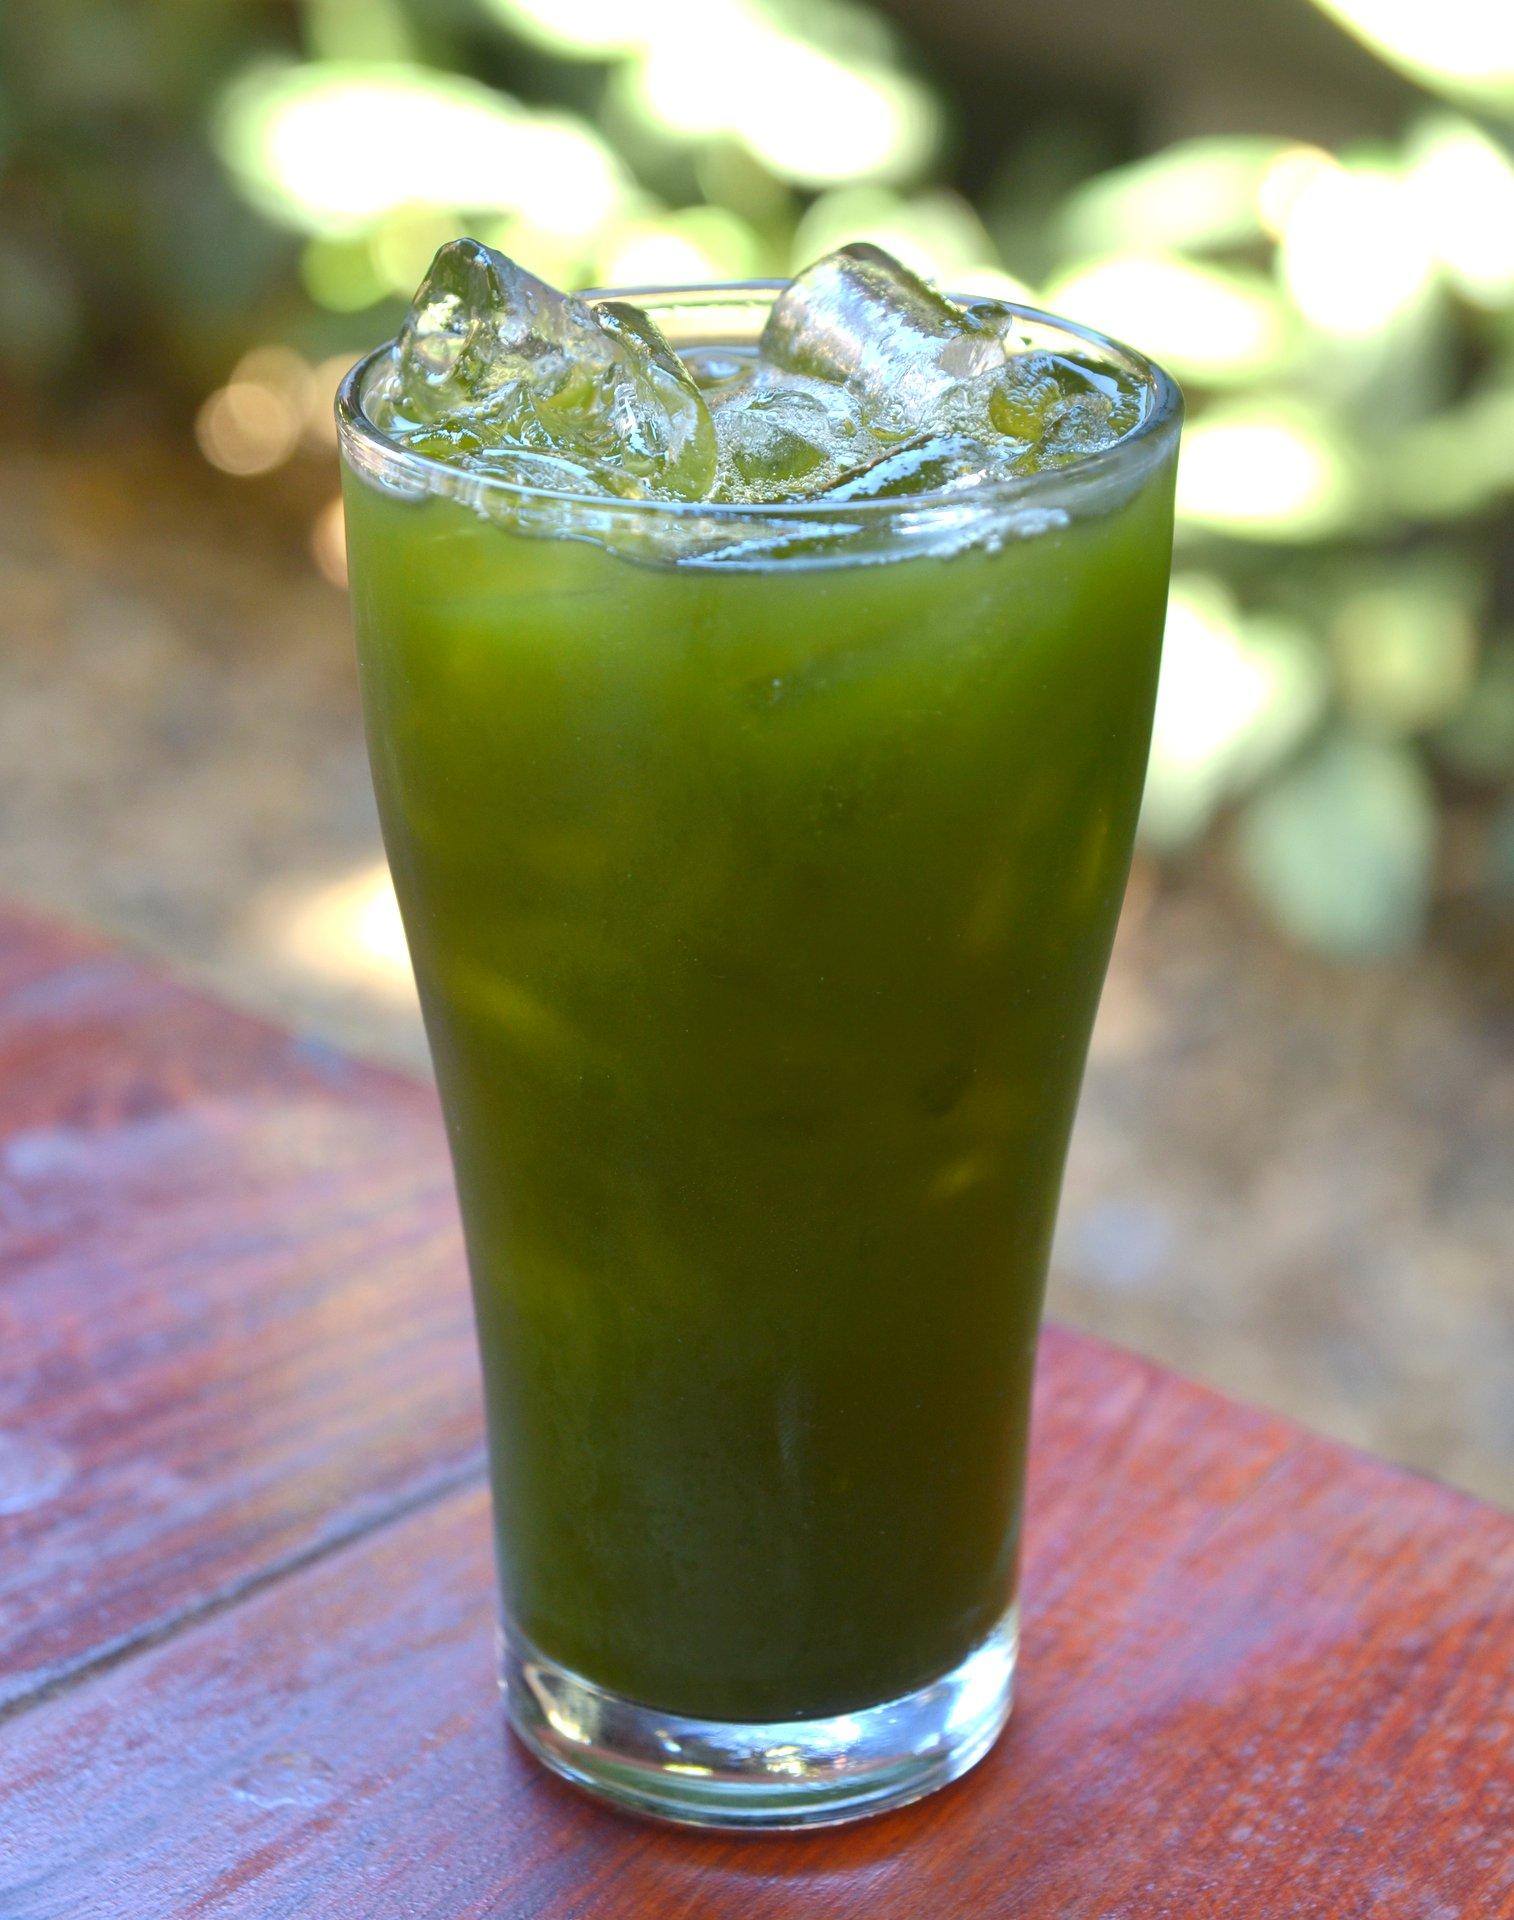 Is Bai Drinks Considered Processed Food